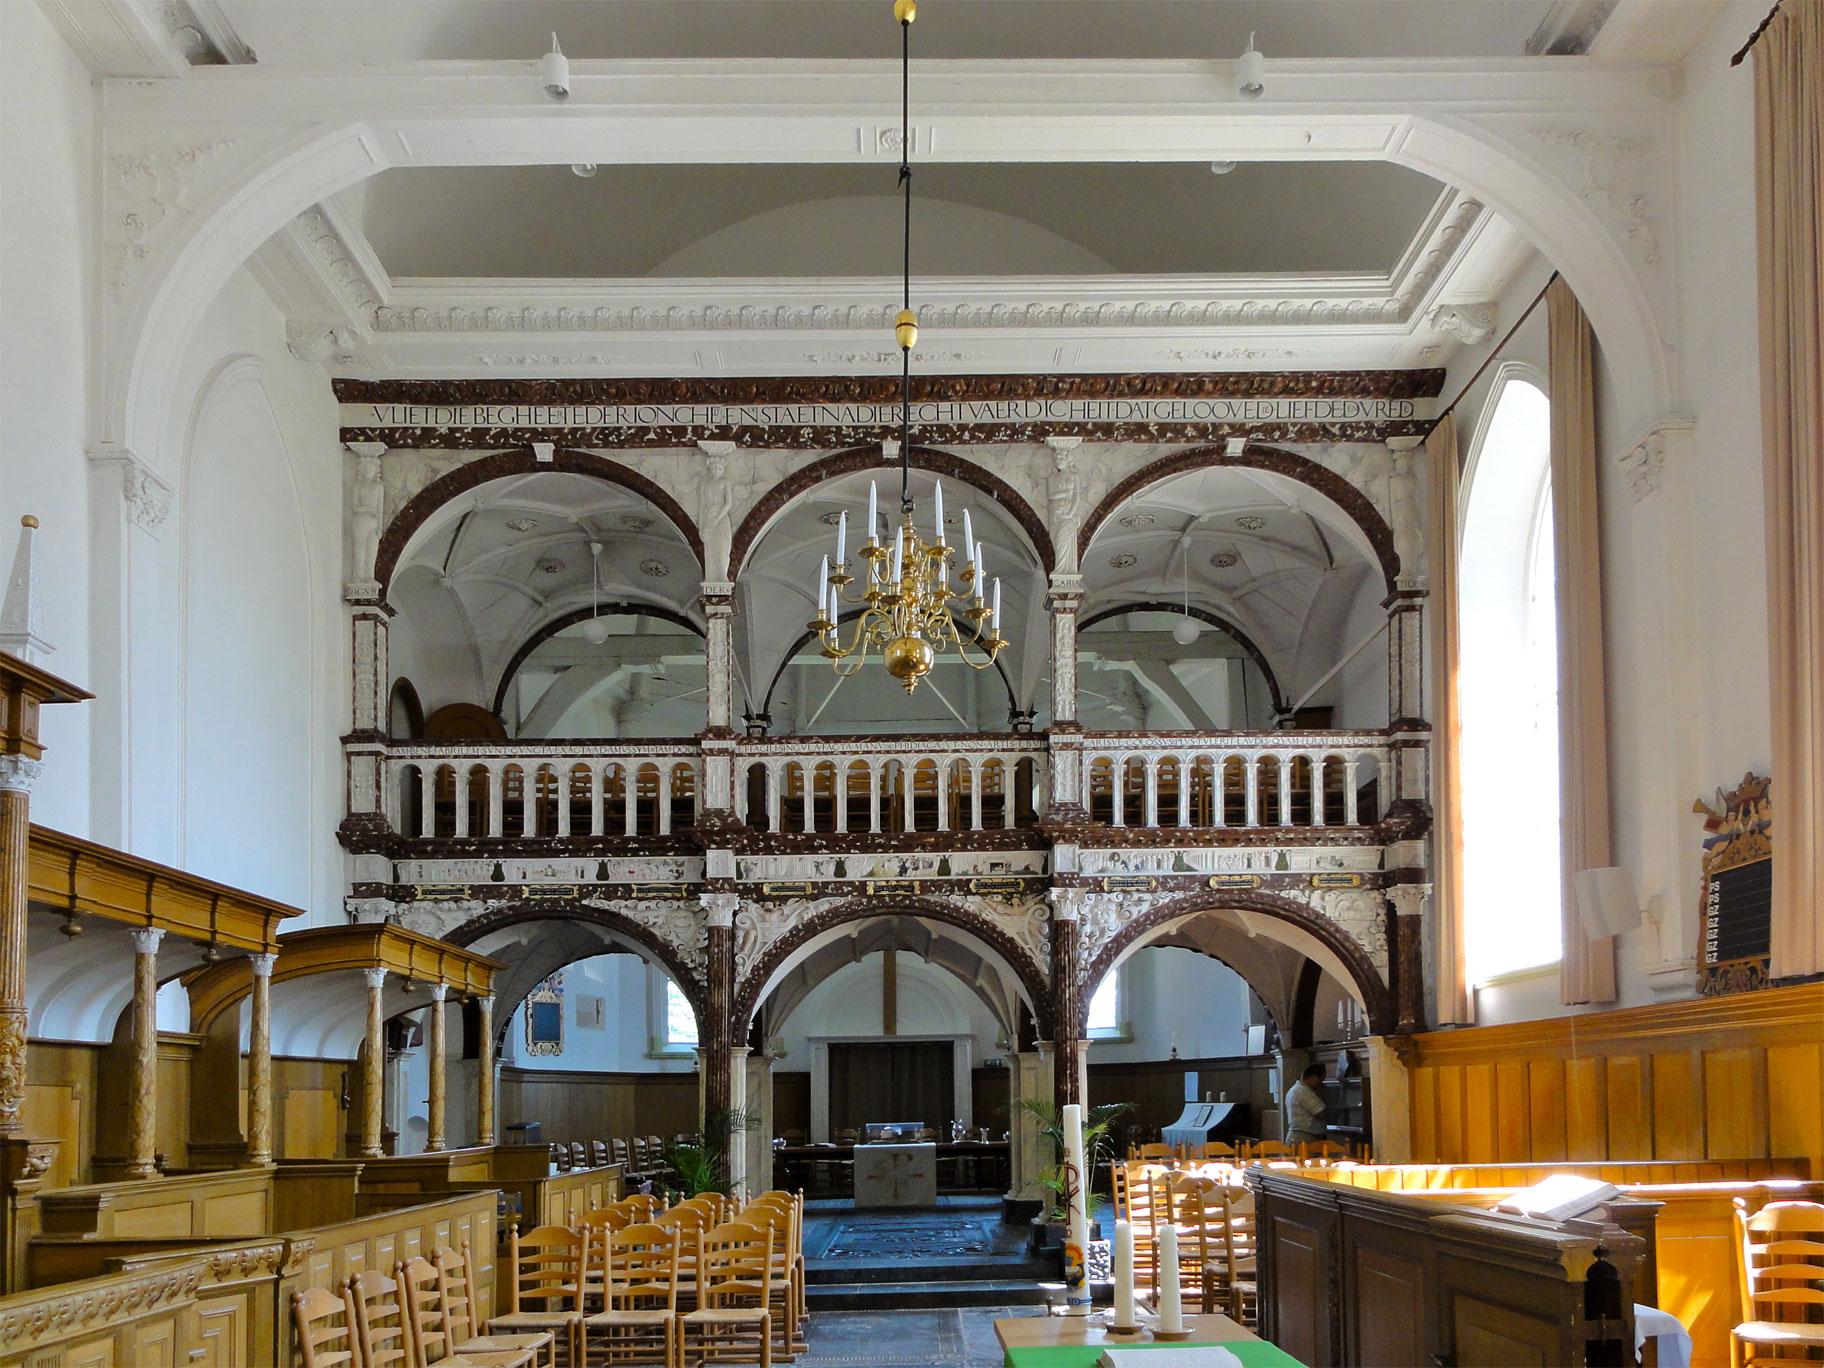 File:Martinikerk Easterein doksaal.jpg - Wikimedia Commons